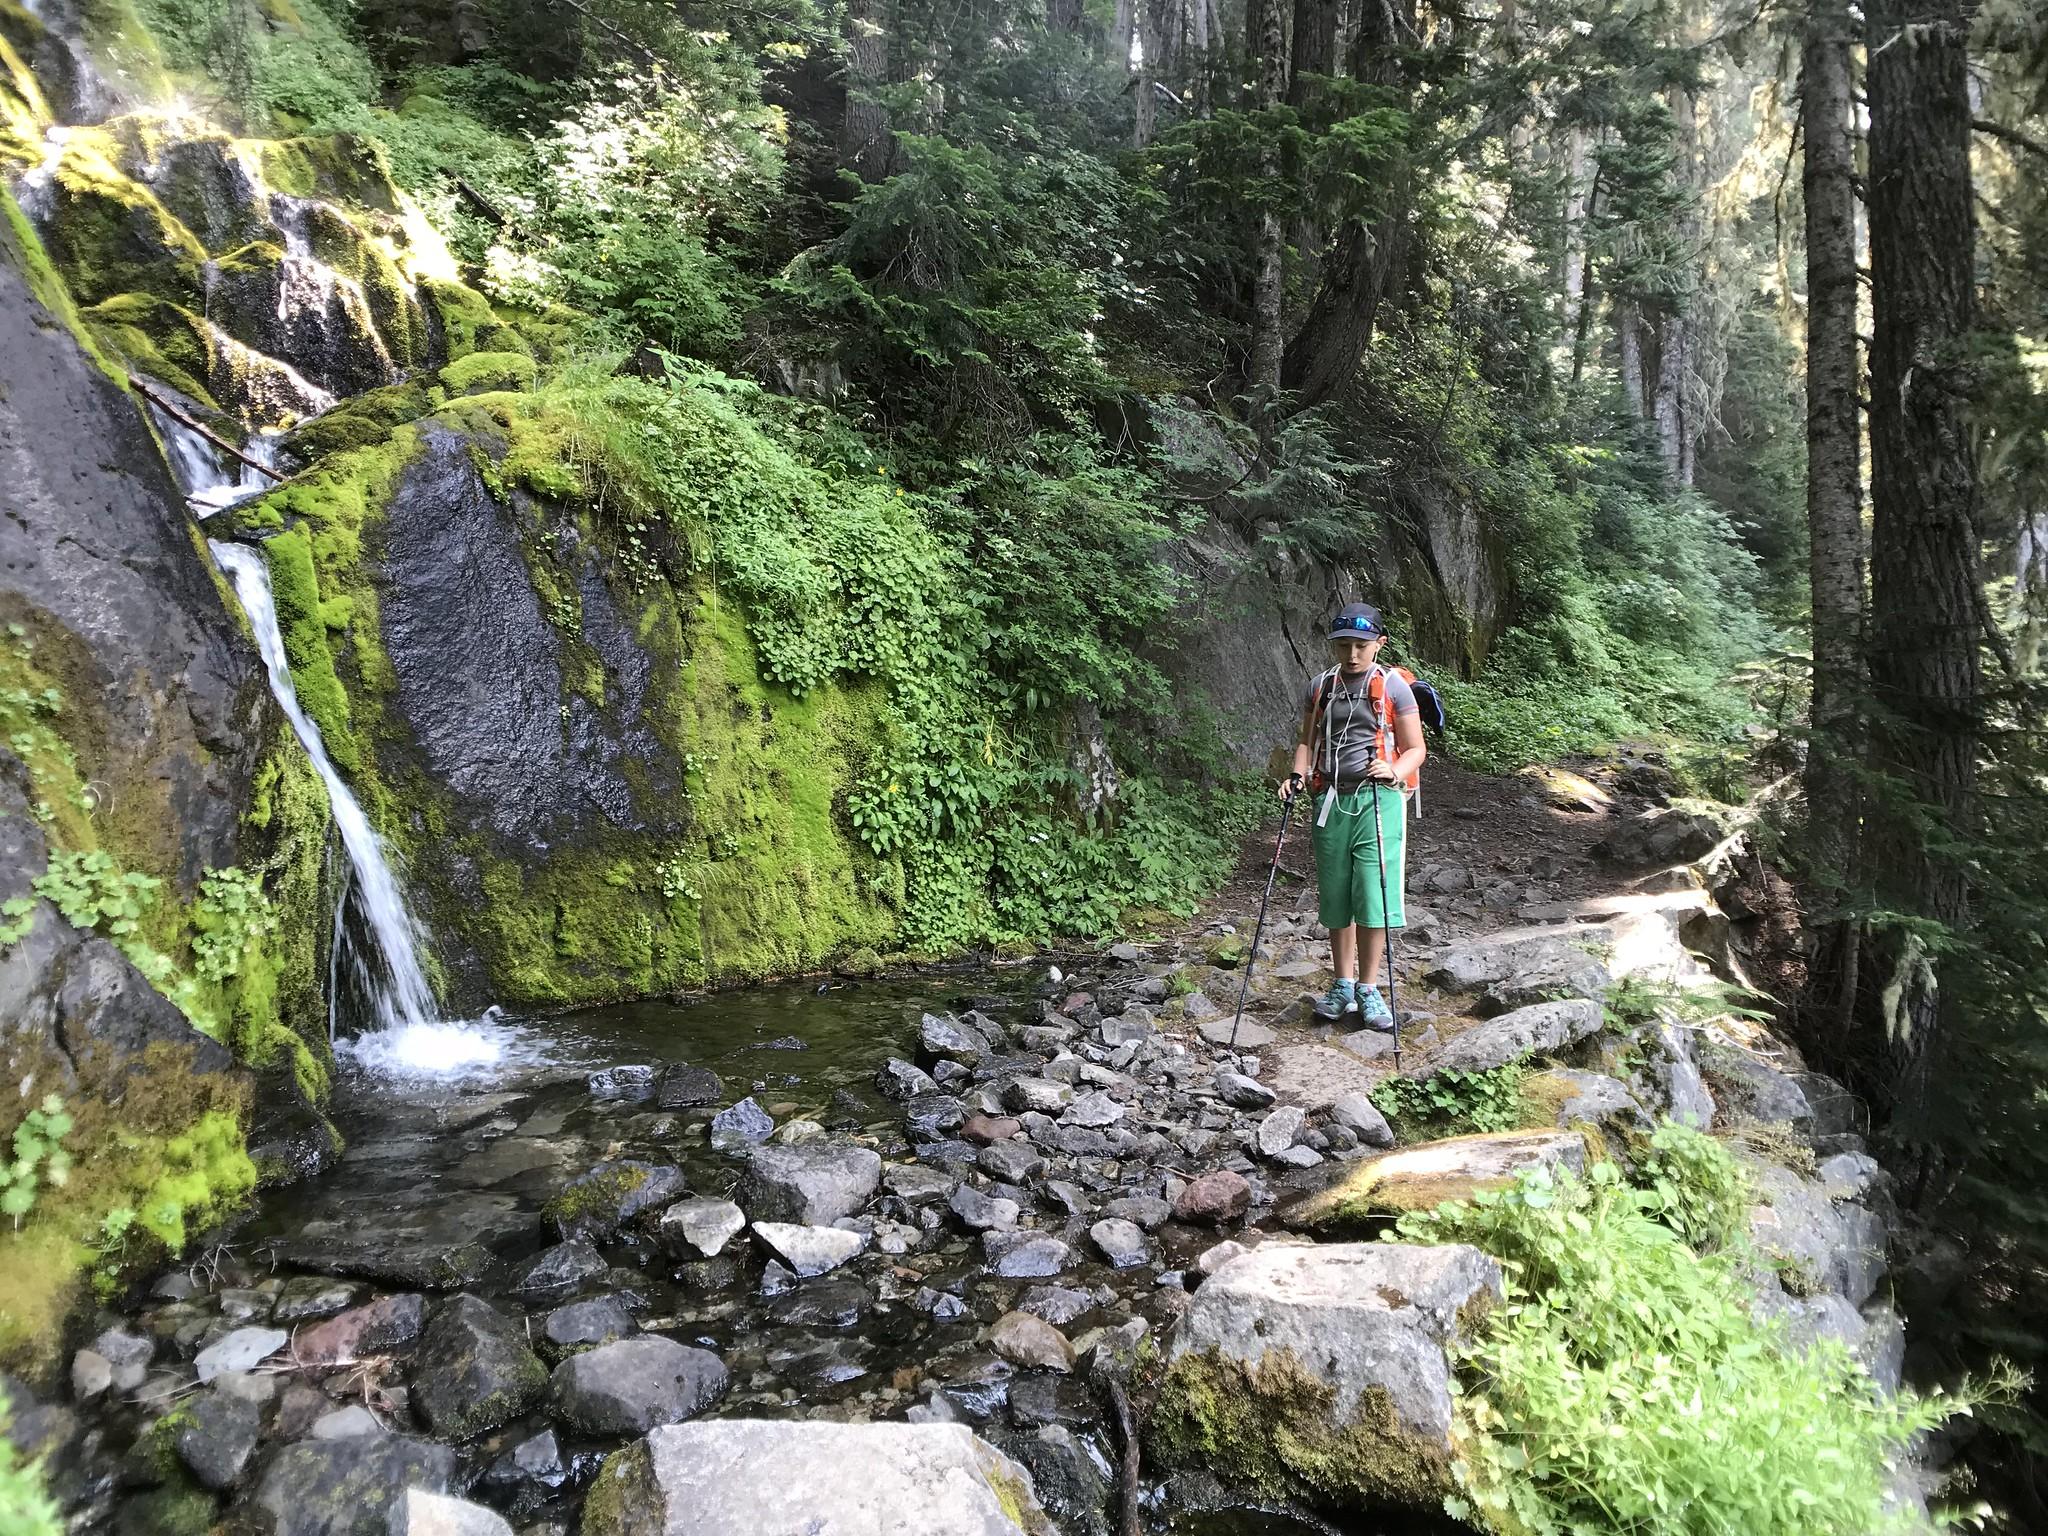 Casper passing a small waterfall